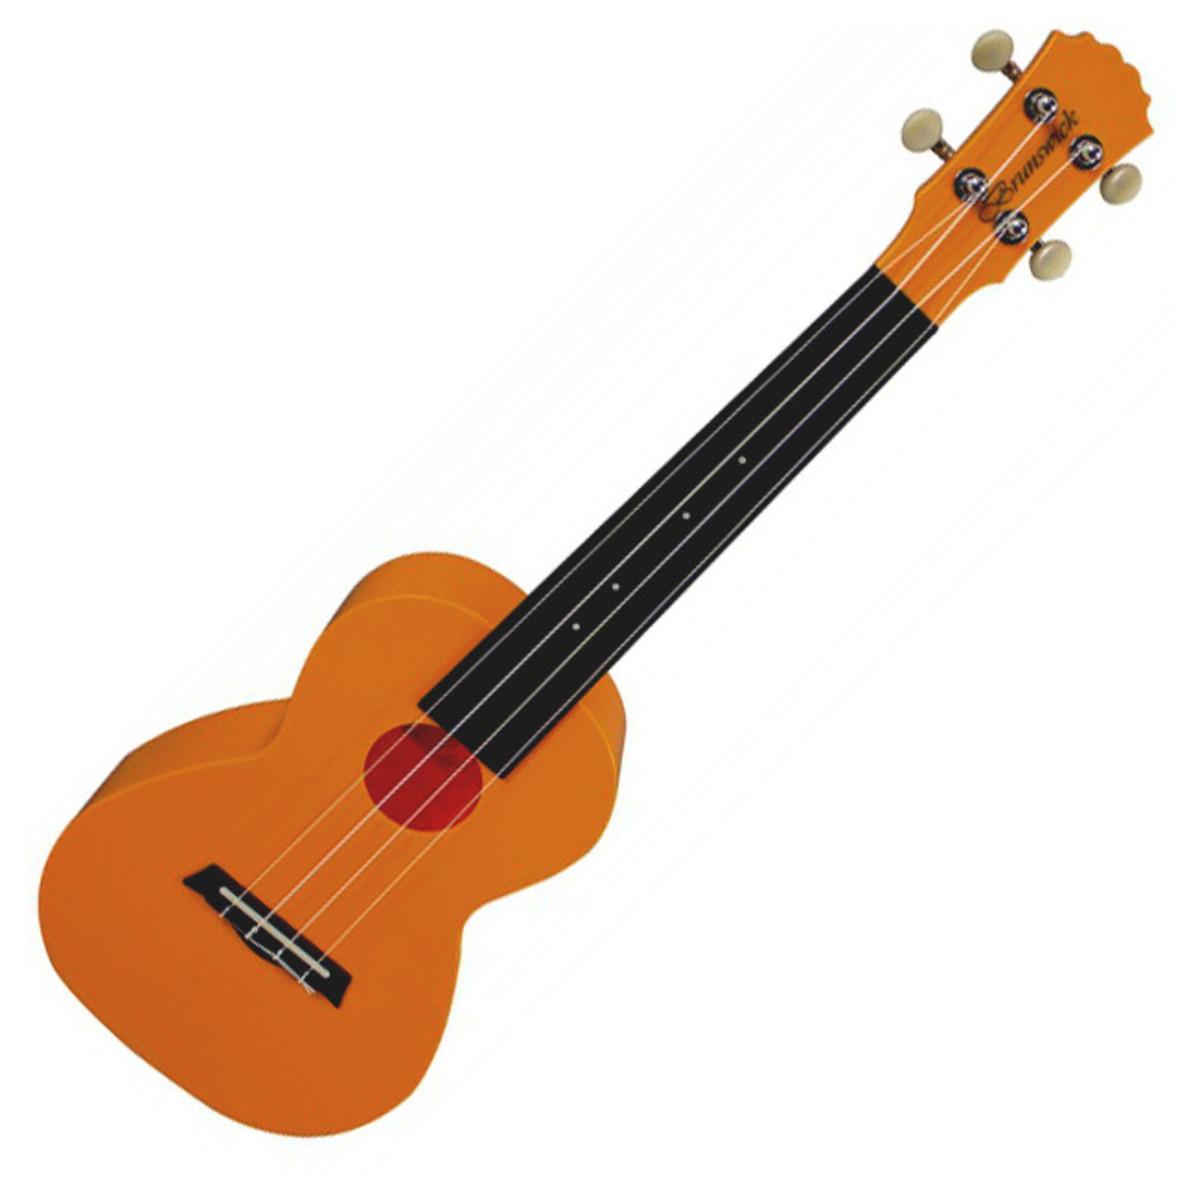 DISC Brunswick Ukulele Concert Orange At Gear4music